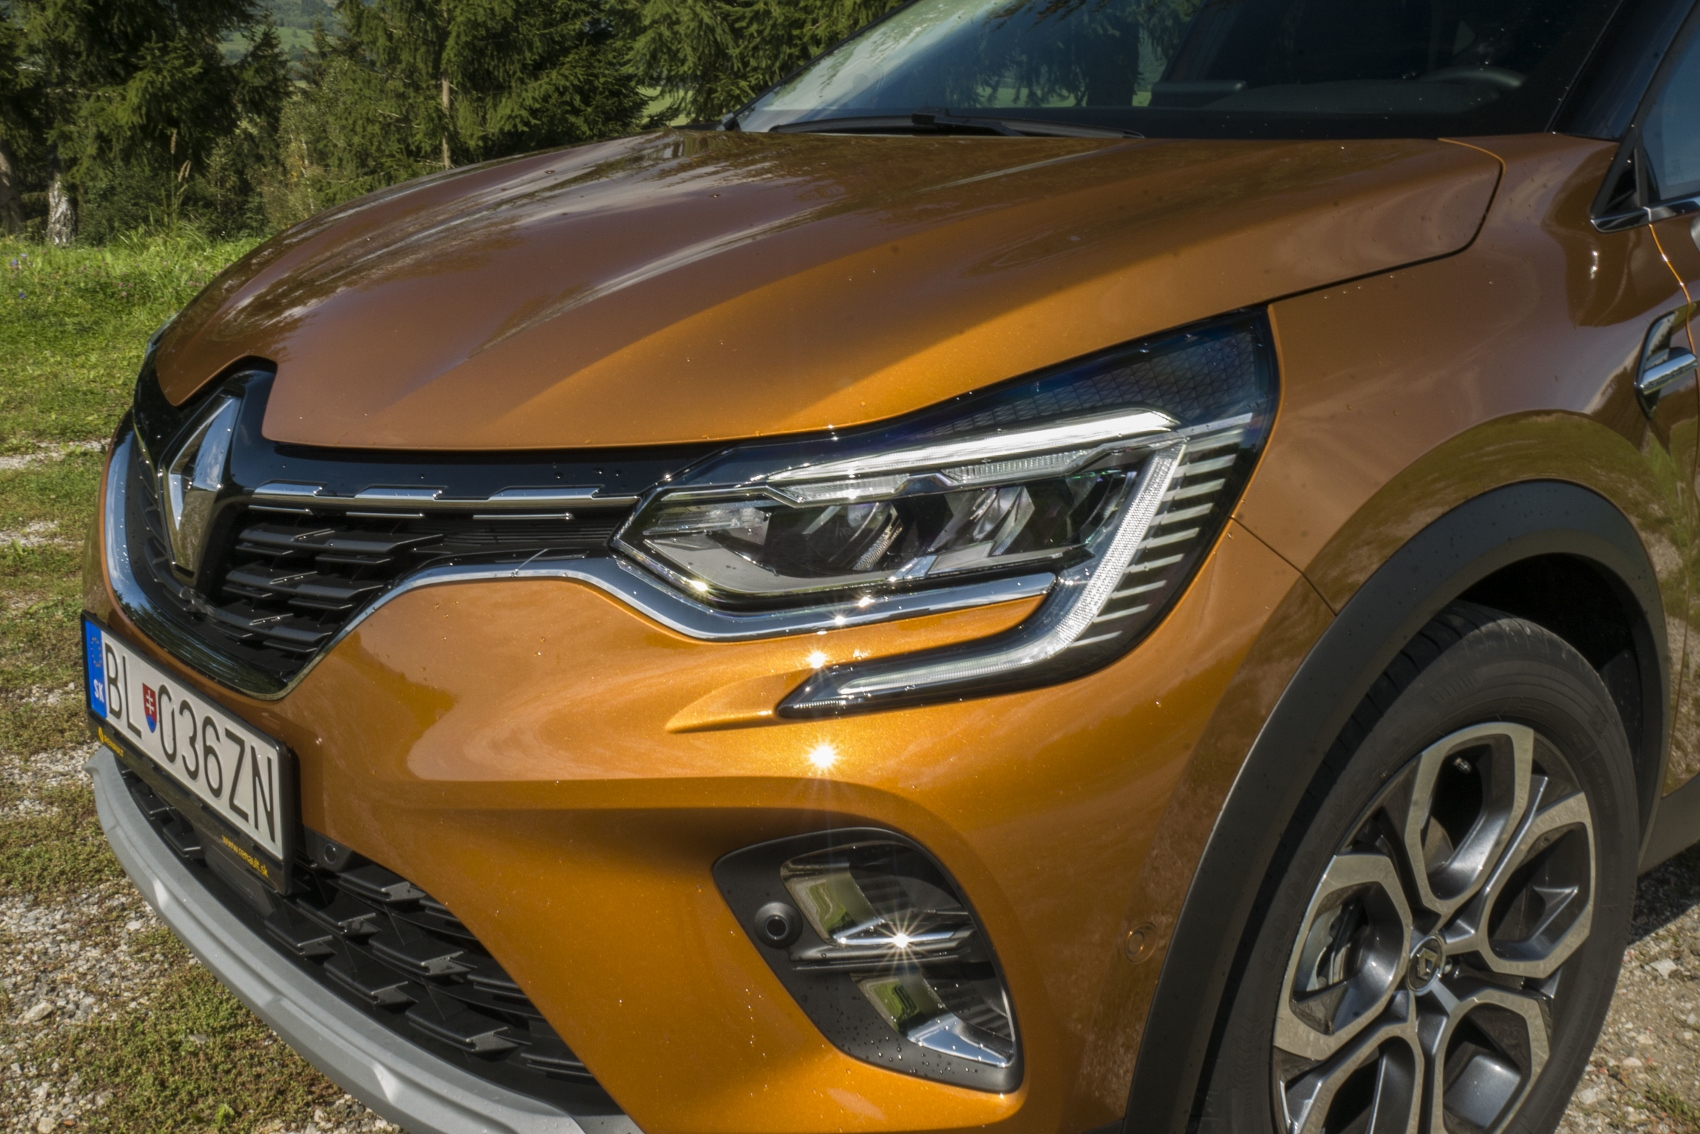 Test: V interiéri sa Renault Captur tvári ako o triedu drahšie auto mmNdnbnVjP renault-captur-3